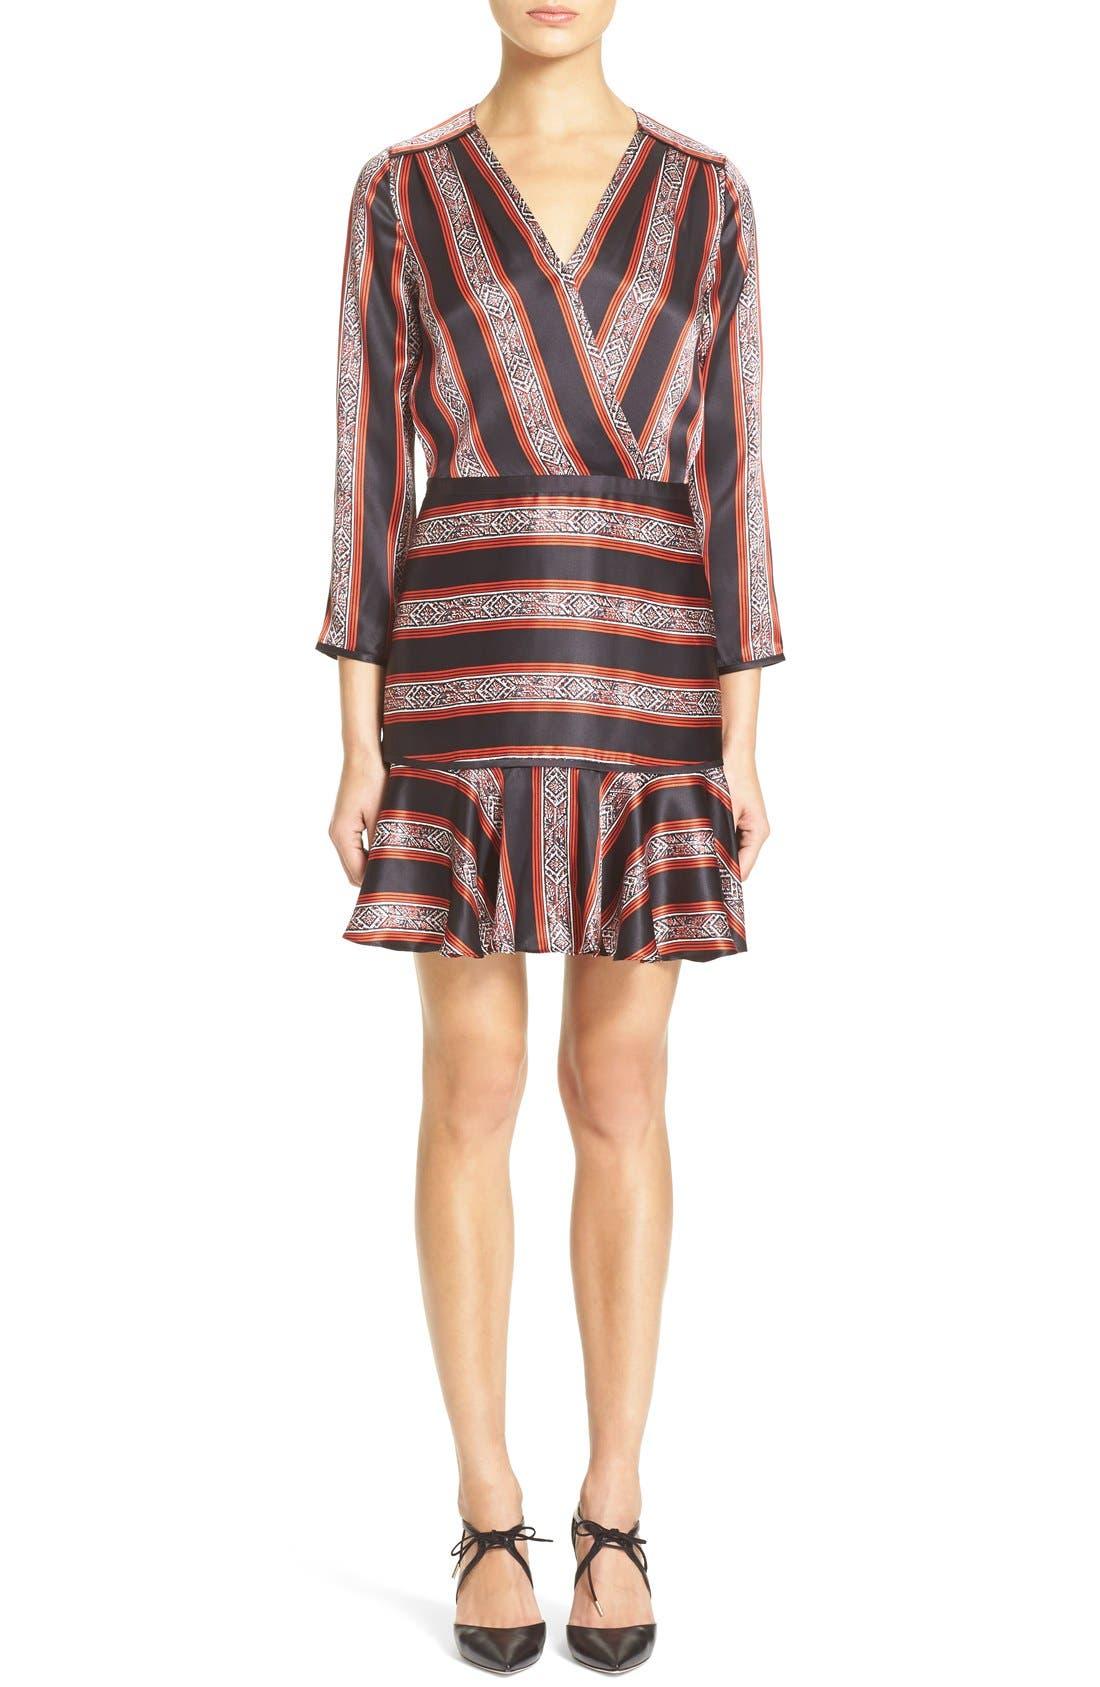 Alternate Image 1 Selected - Veronica Beard 'Ivy' Print SilkFlounce Dress